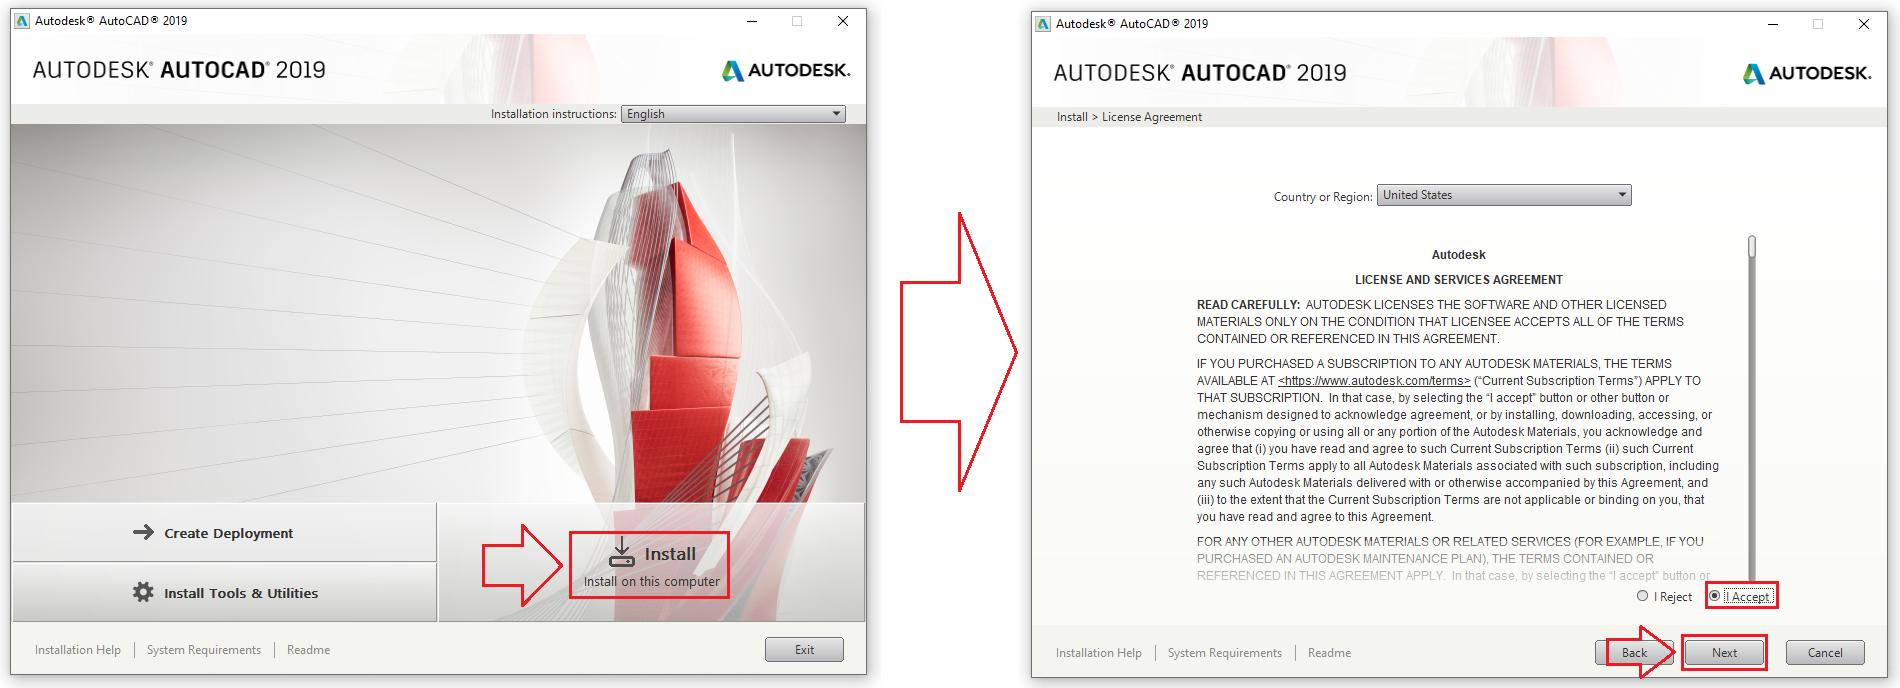 Download Autodesk AutoCAD 2019 Link Google Drive + Hướng dẫn cài đặt chi tiết